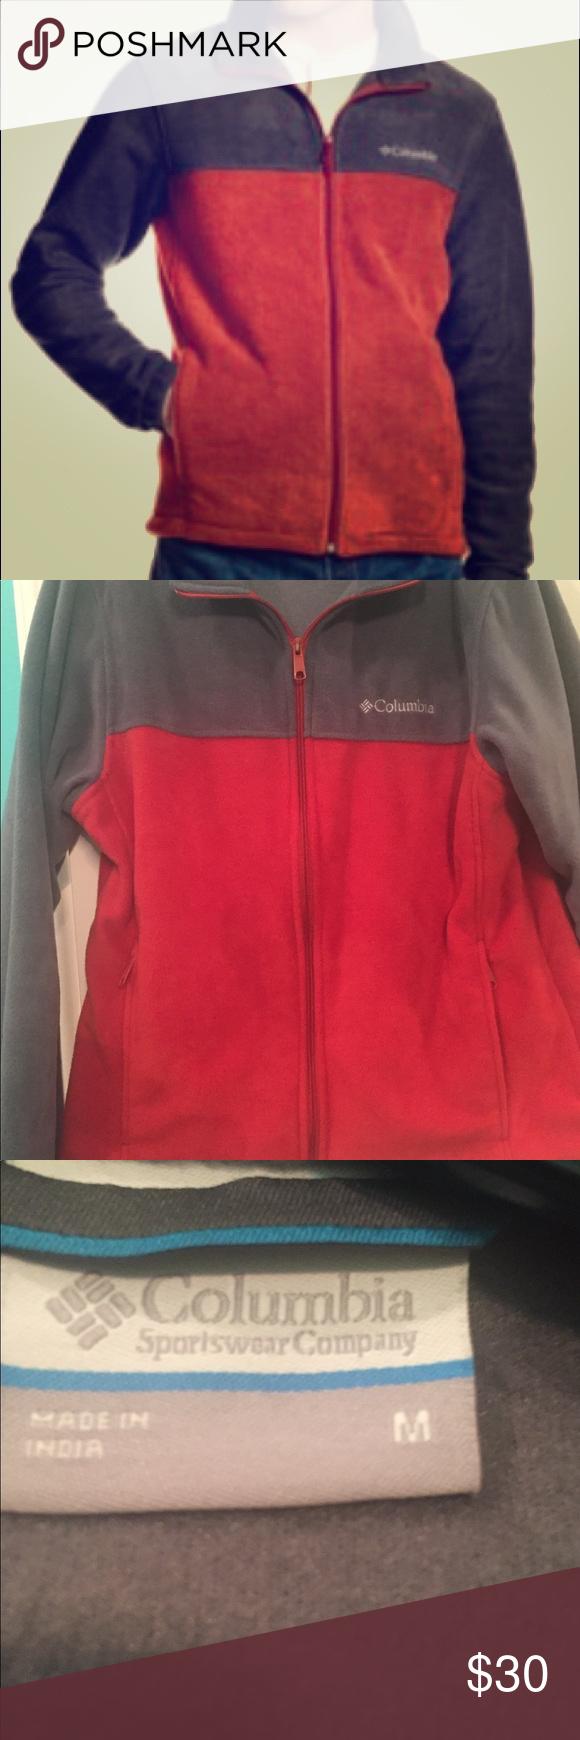 Menus columbia fleece jacket columbia menus jacket and zip